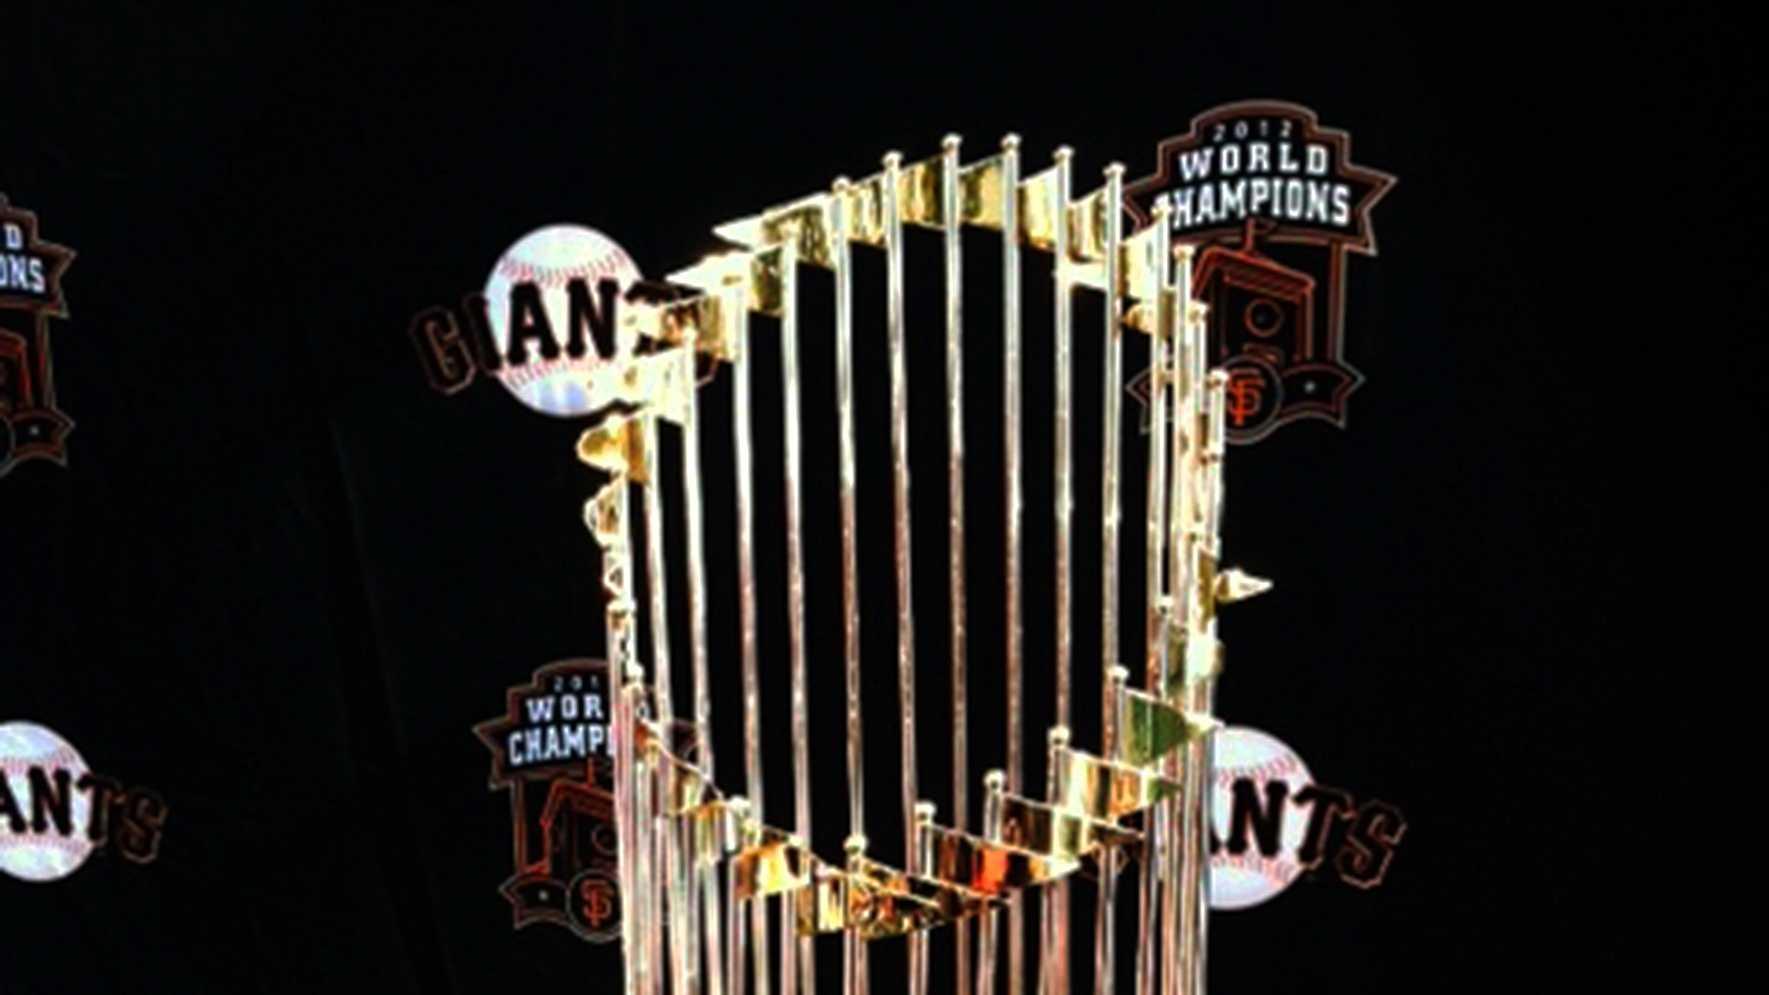 SF Giants World Series Trophy